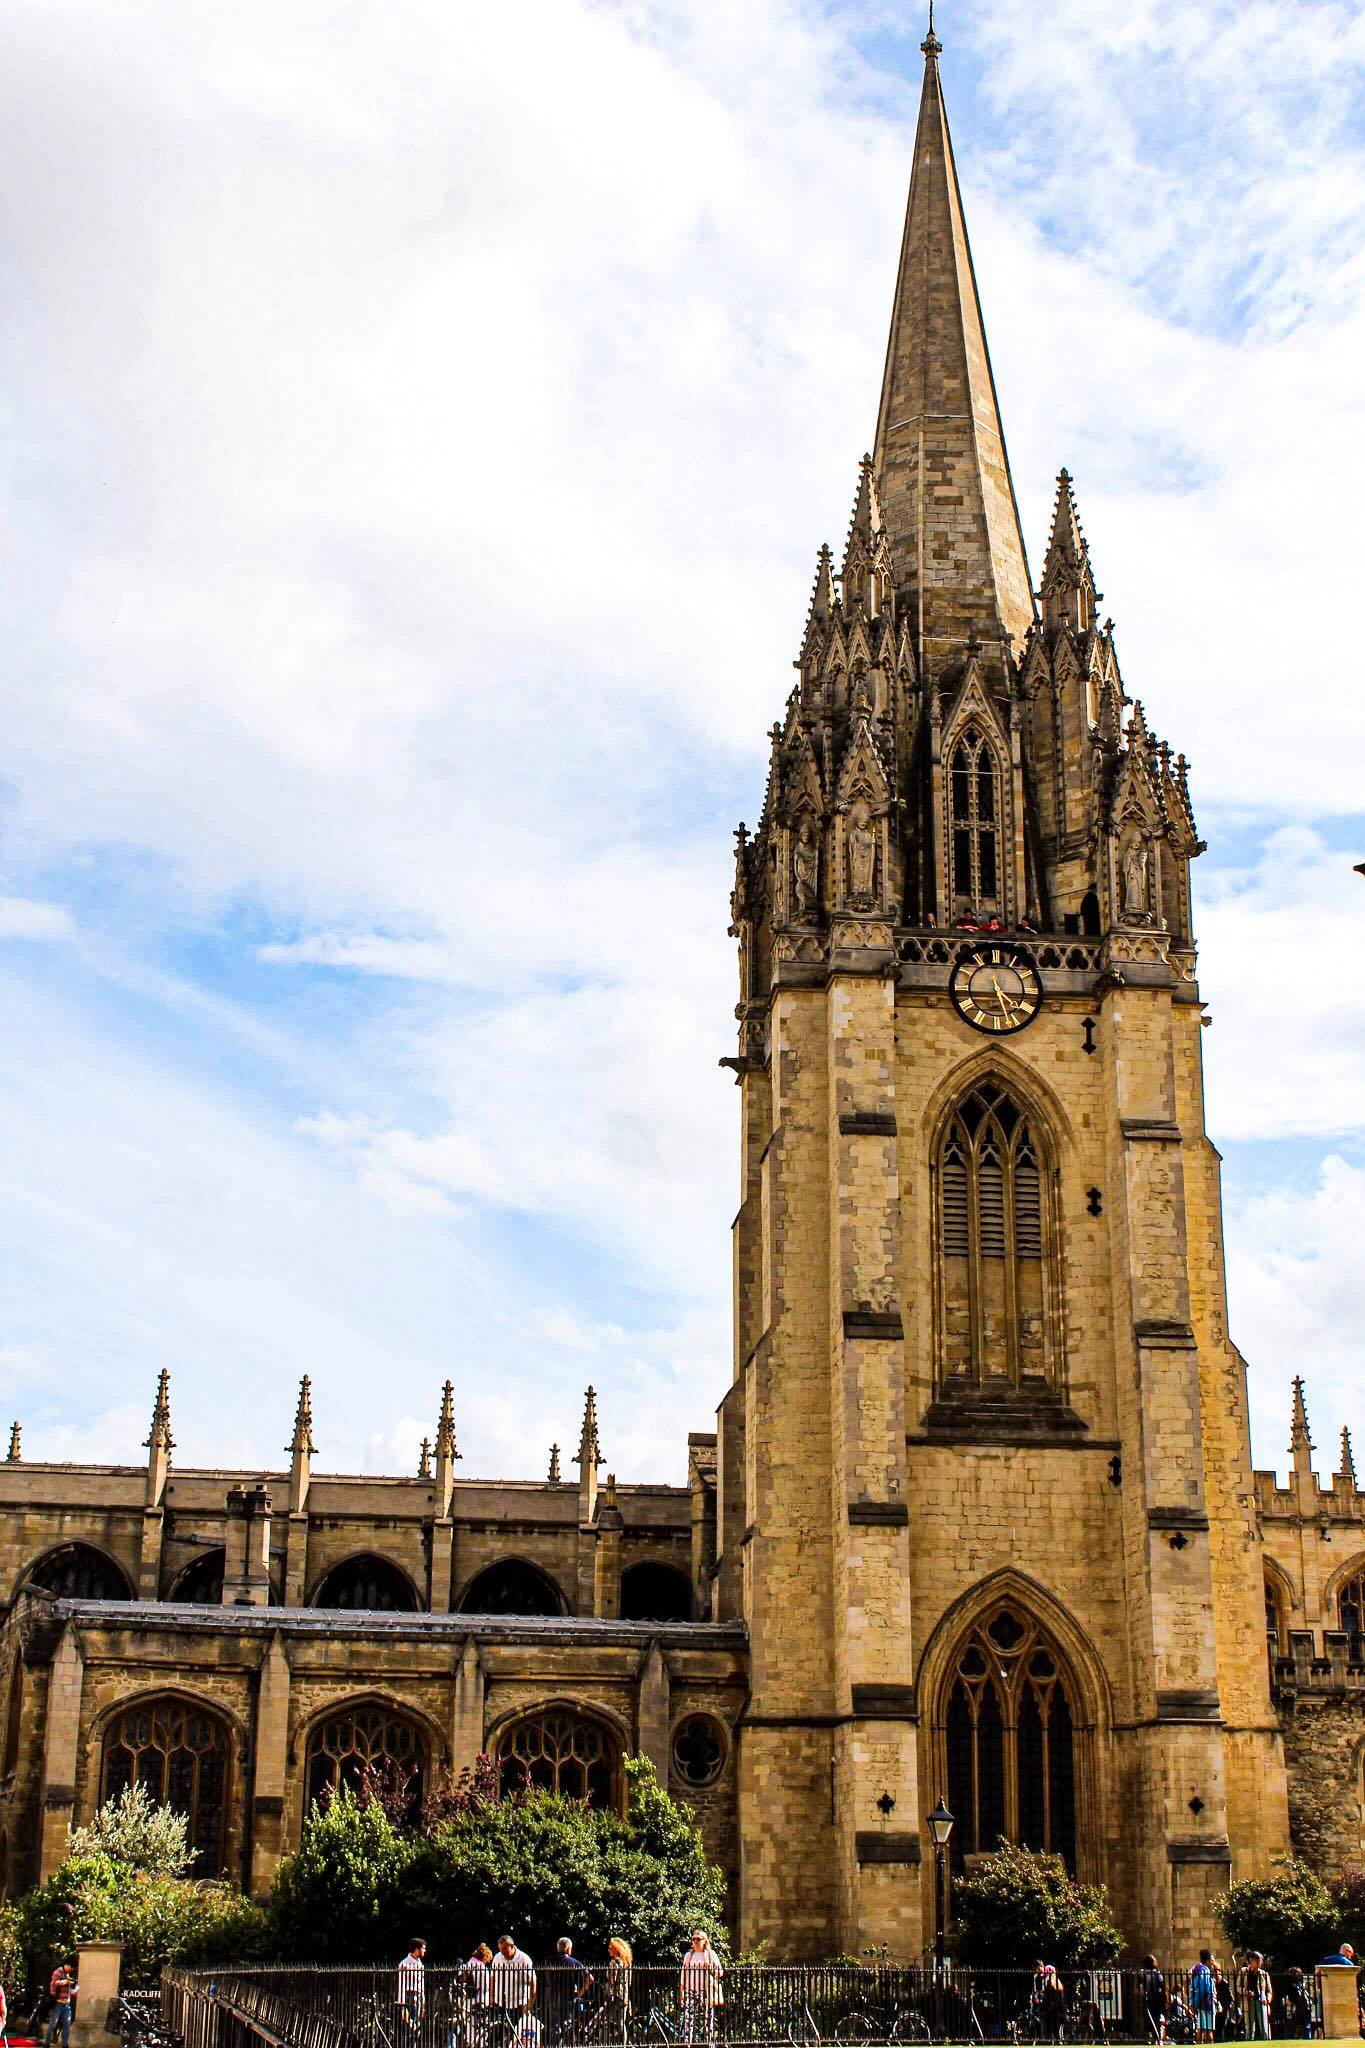 Trip to Oxford